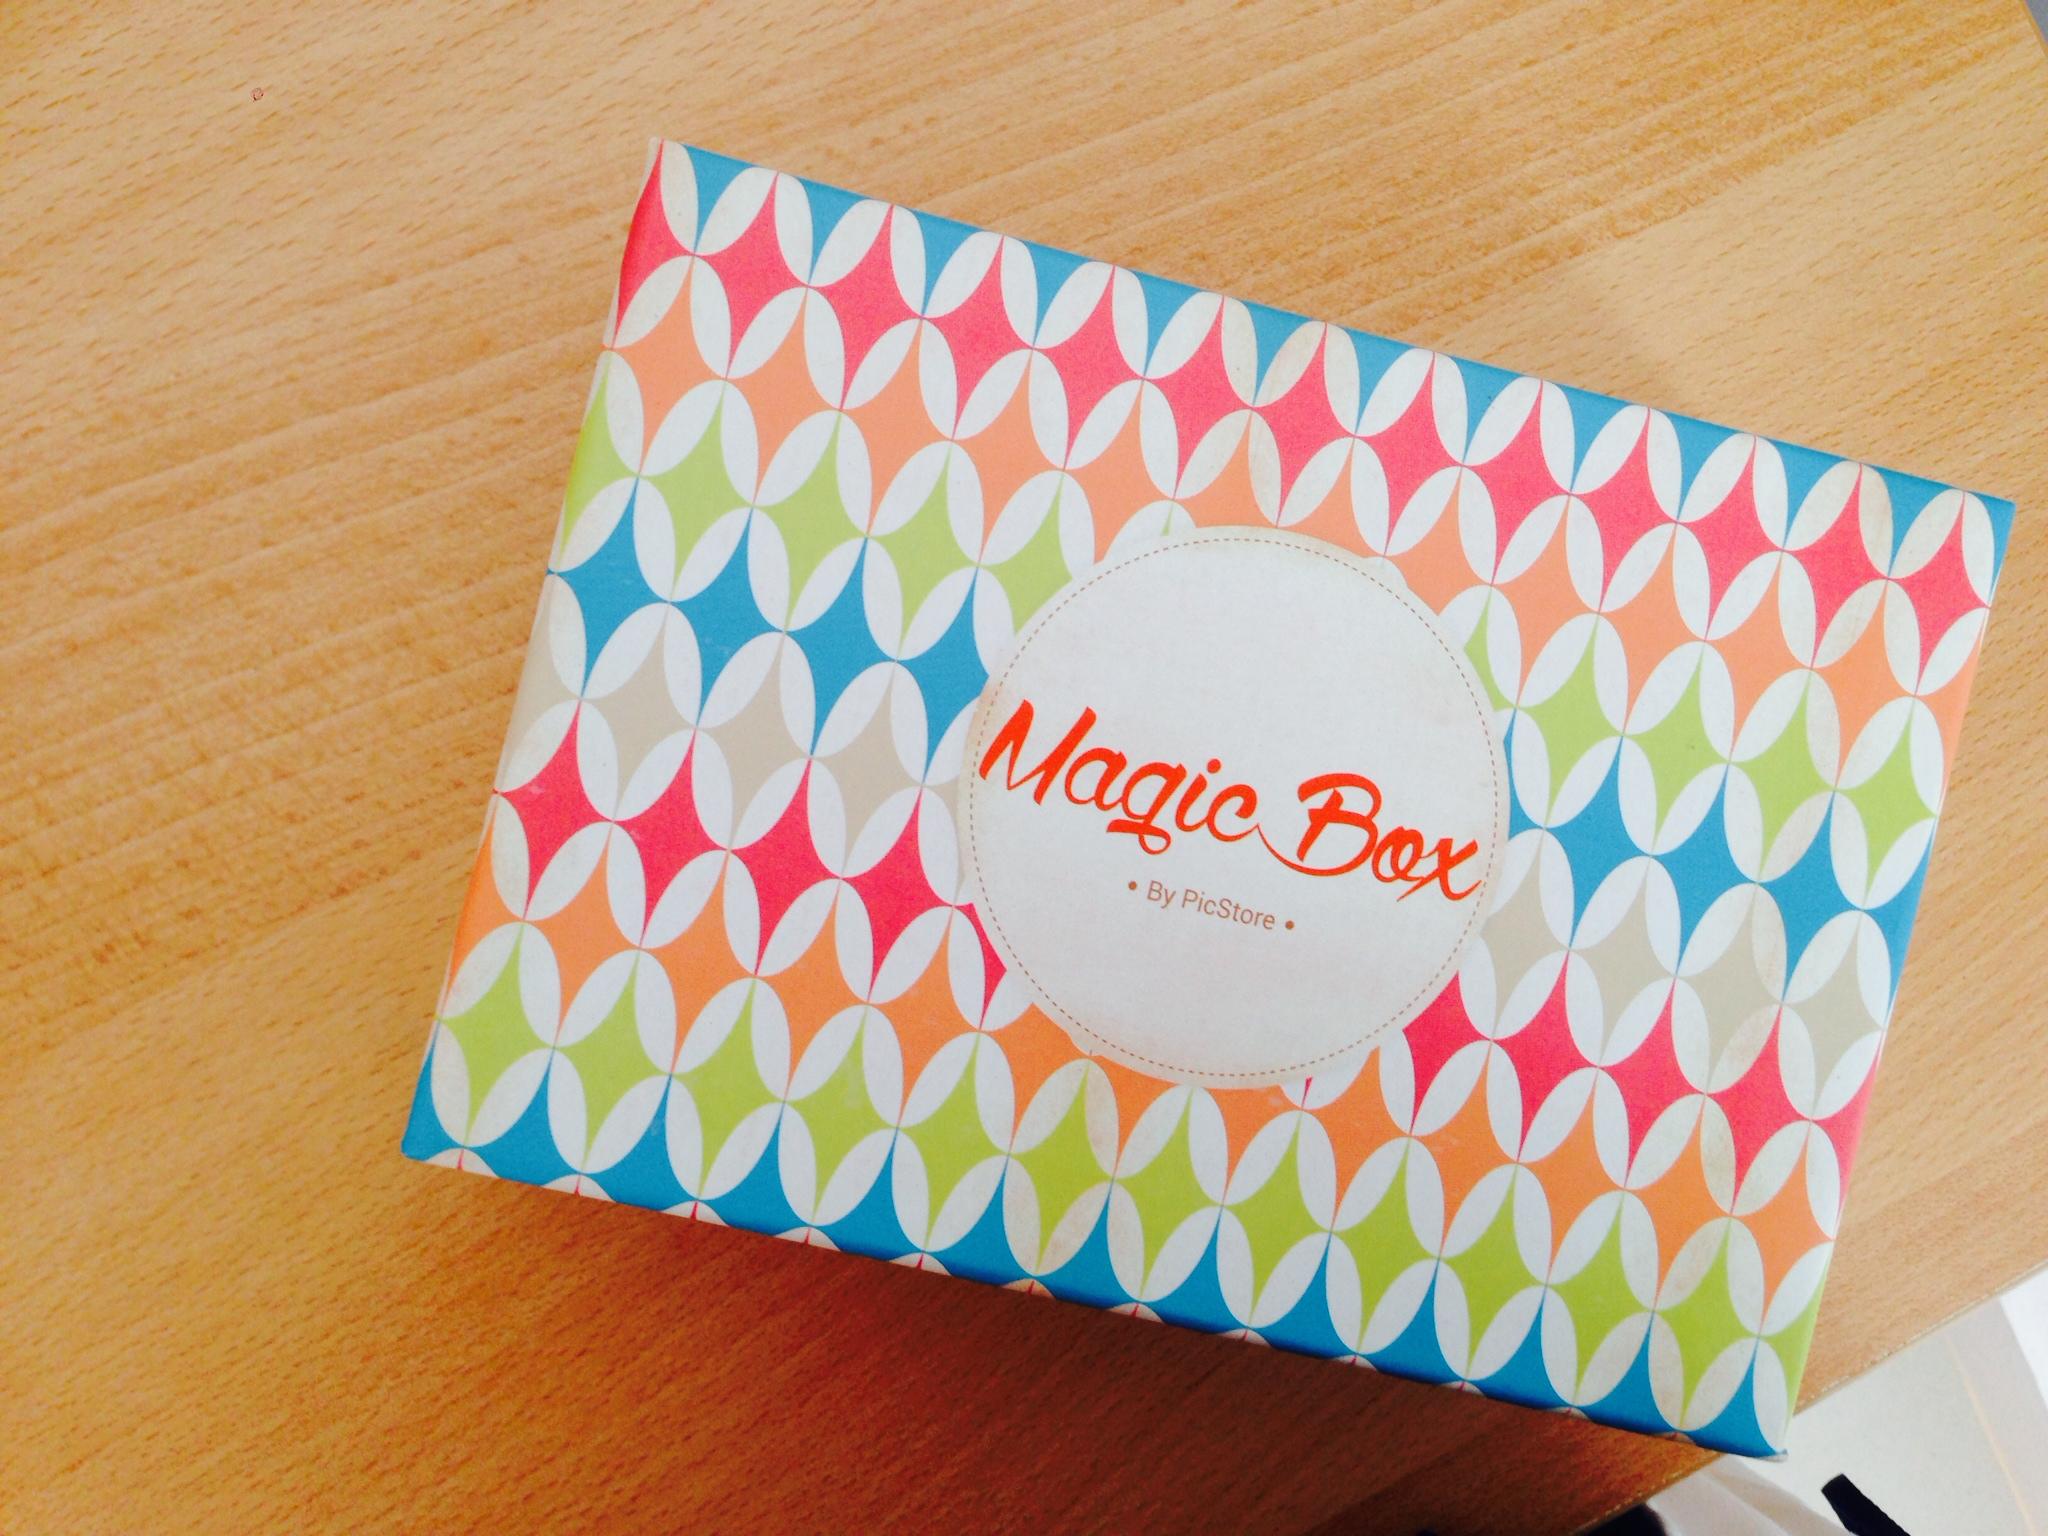 MagicBox_PicStore_ Vita Luna Spirit (2)